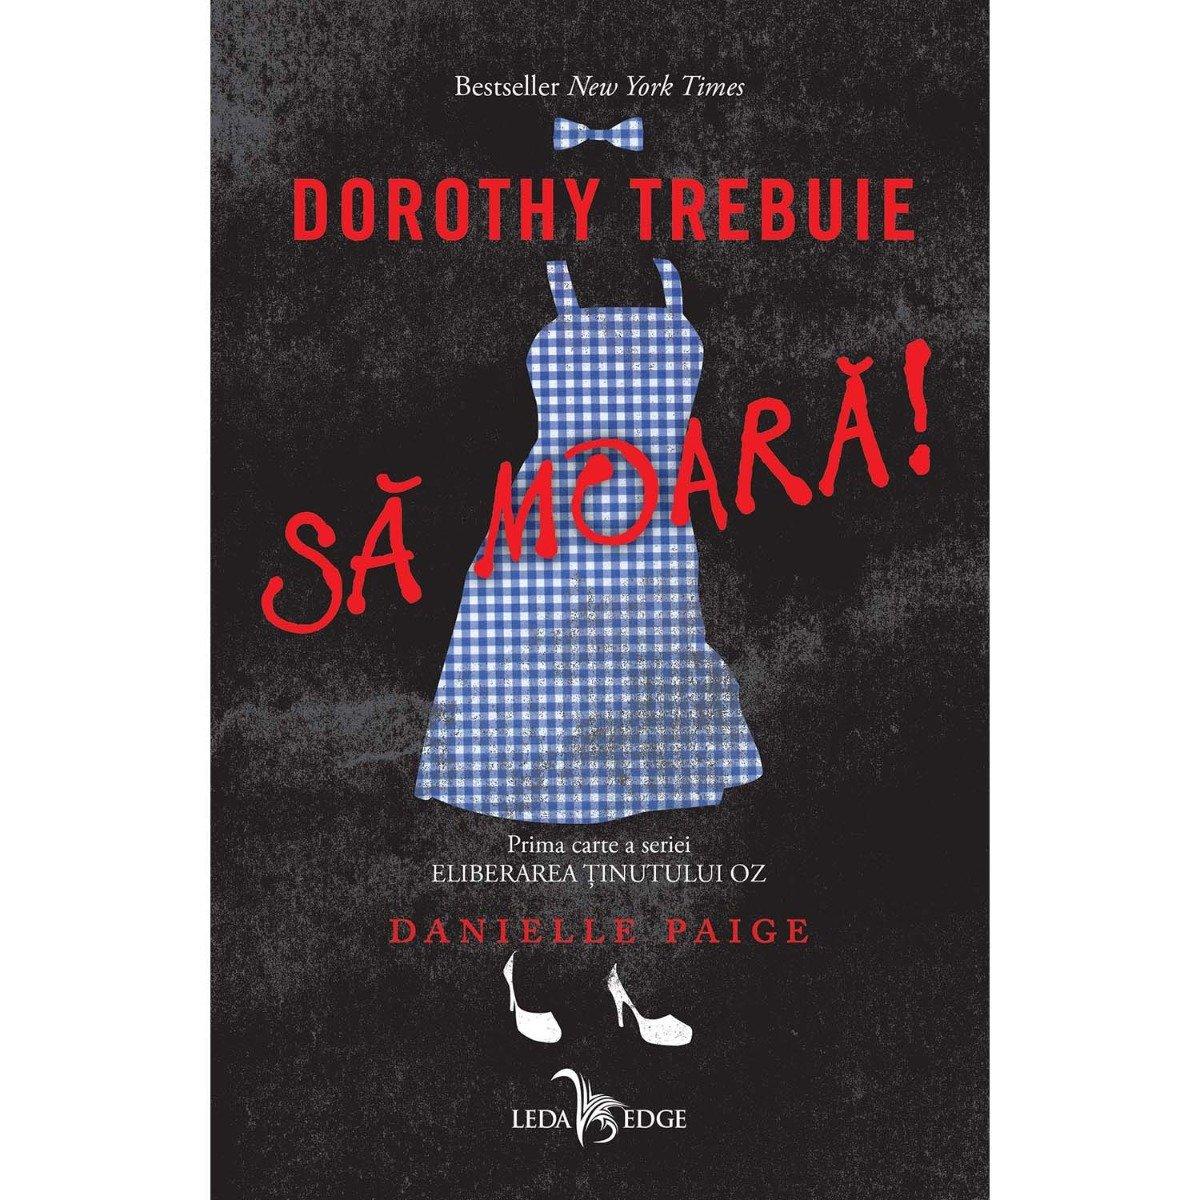 Carte Editura Corint, Eliberarea tinutului Oz vol.1 Dorothy trebuie sa moara!, Danielle Paige imagine